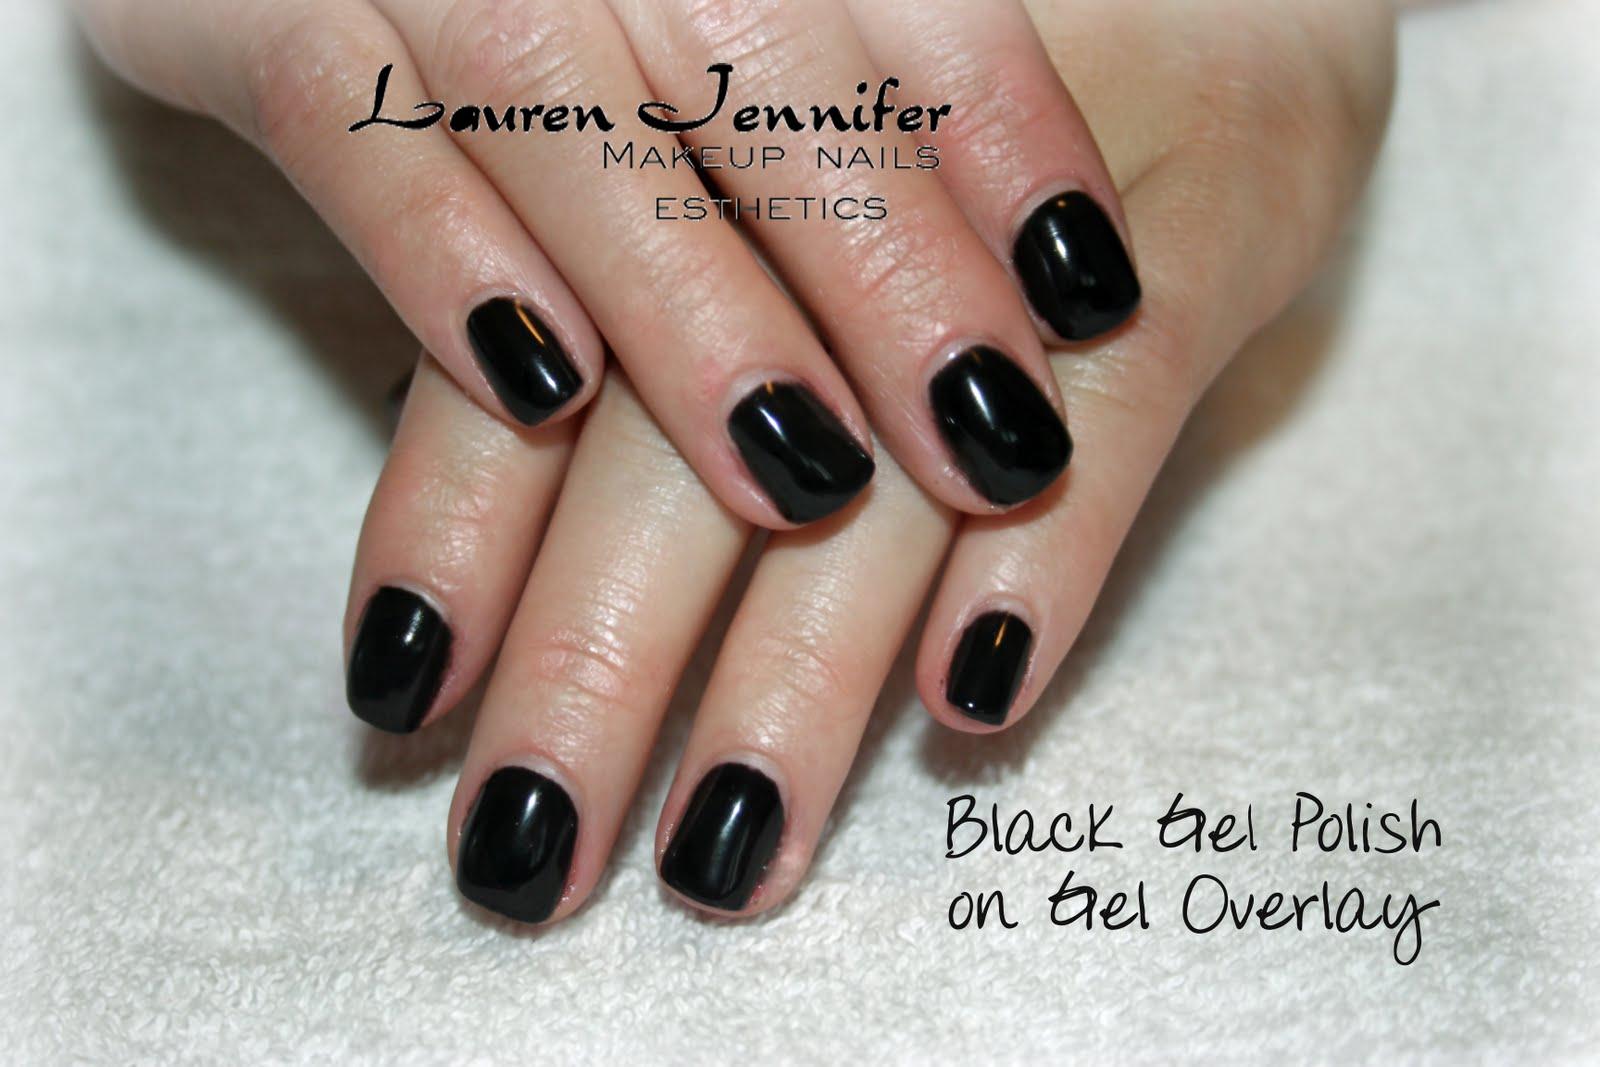 Black+Gel+Polish+on+Gel+Overlay.jpg